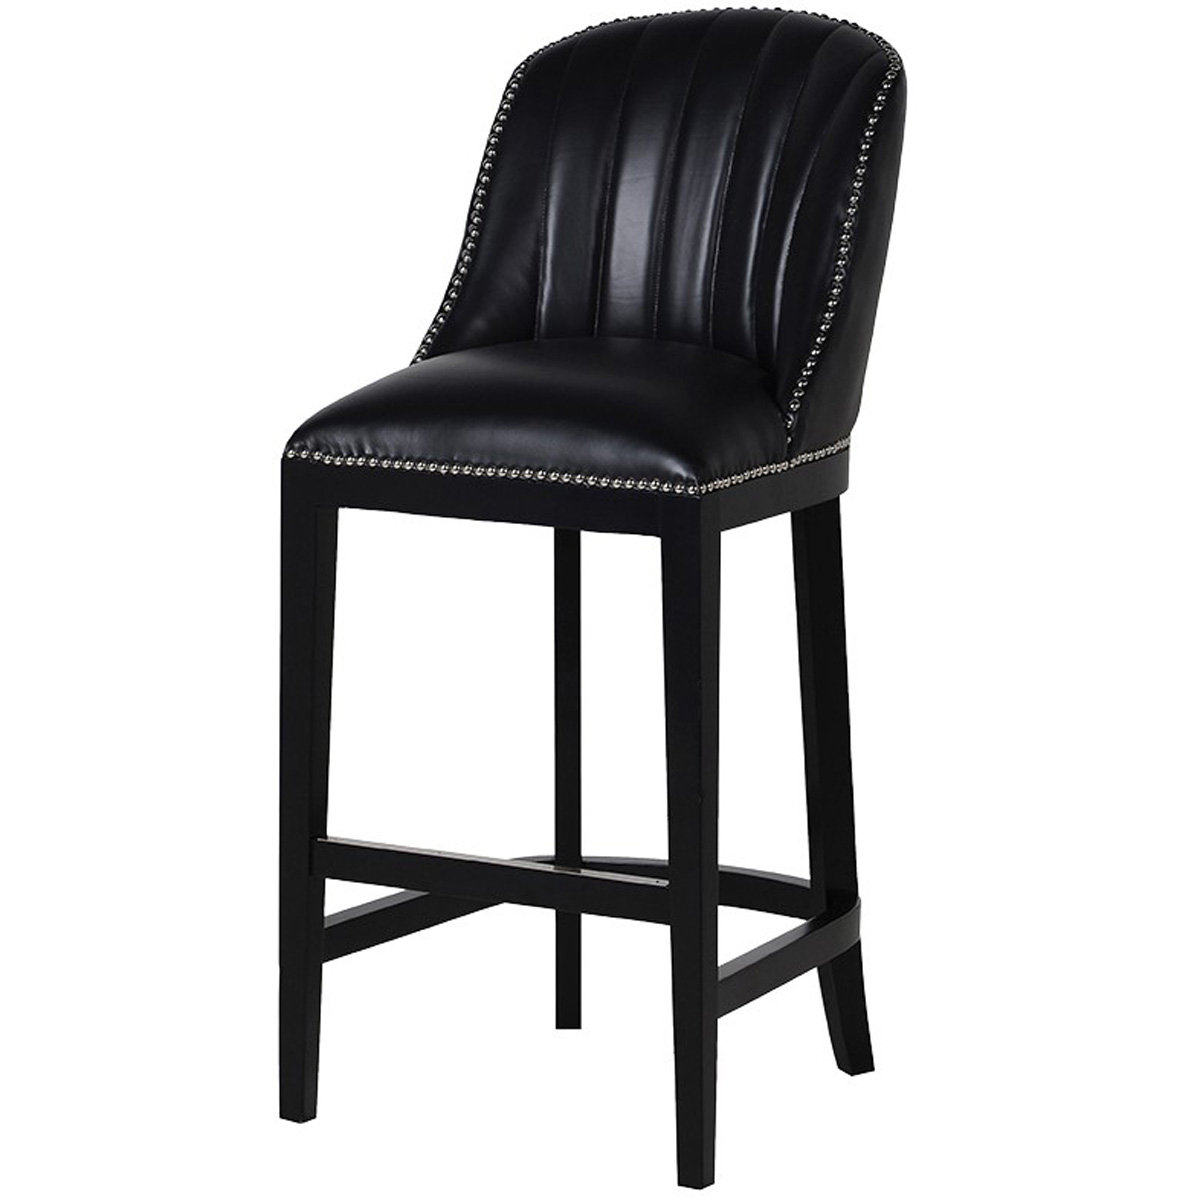 Upholstered Black Leather Bar Stool Interior Flair